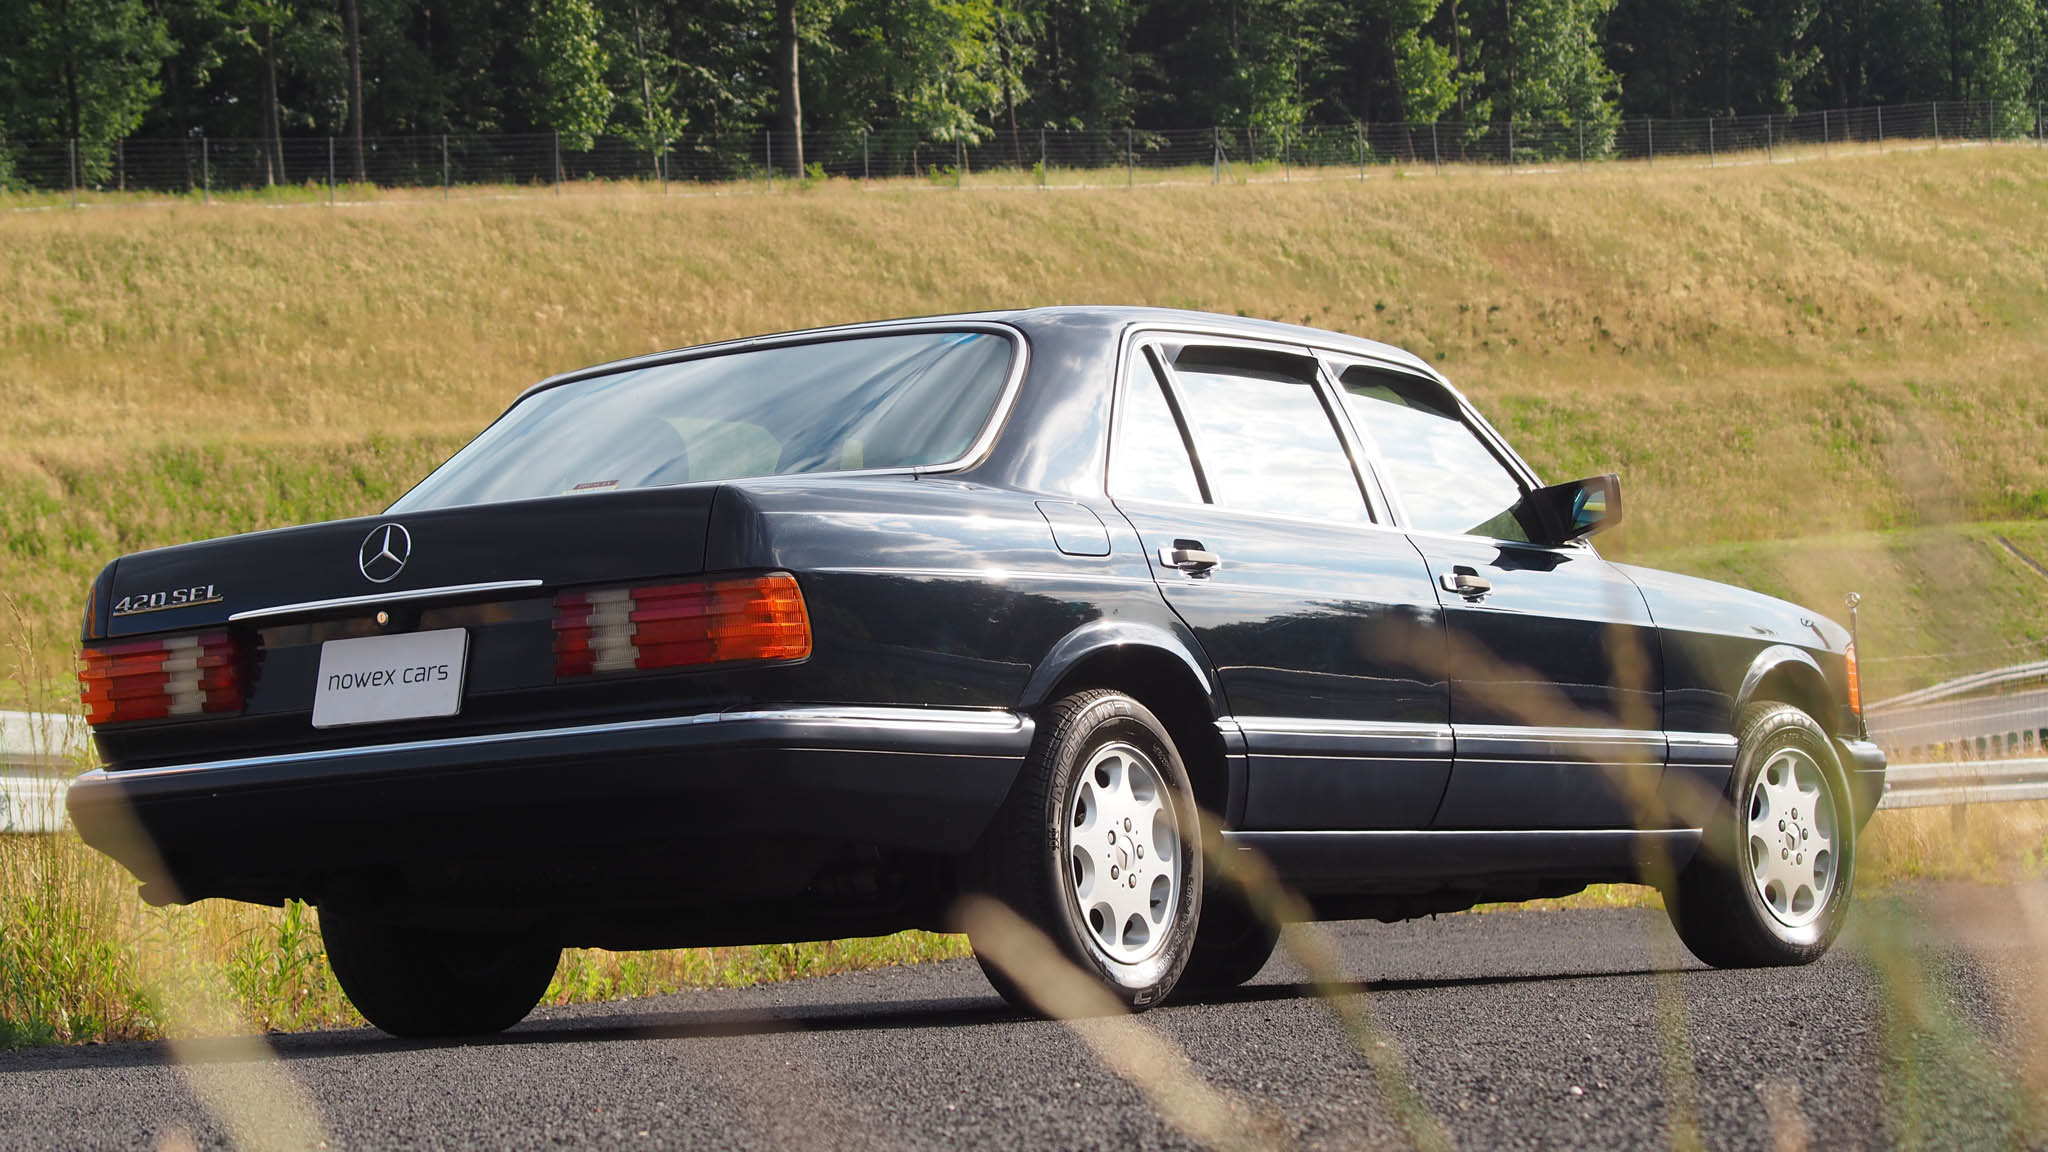 88 mercedes benz 420 sel nowex cars for Mercedes benz 420